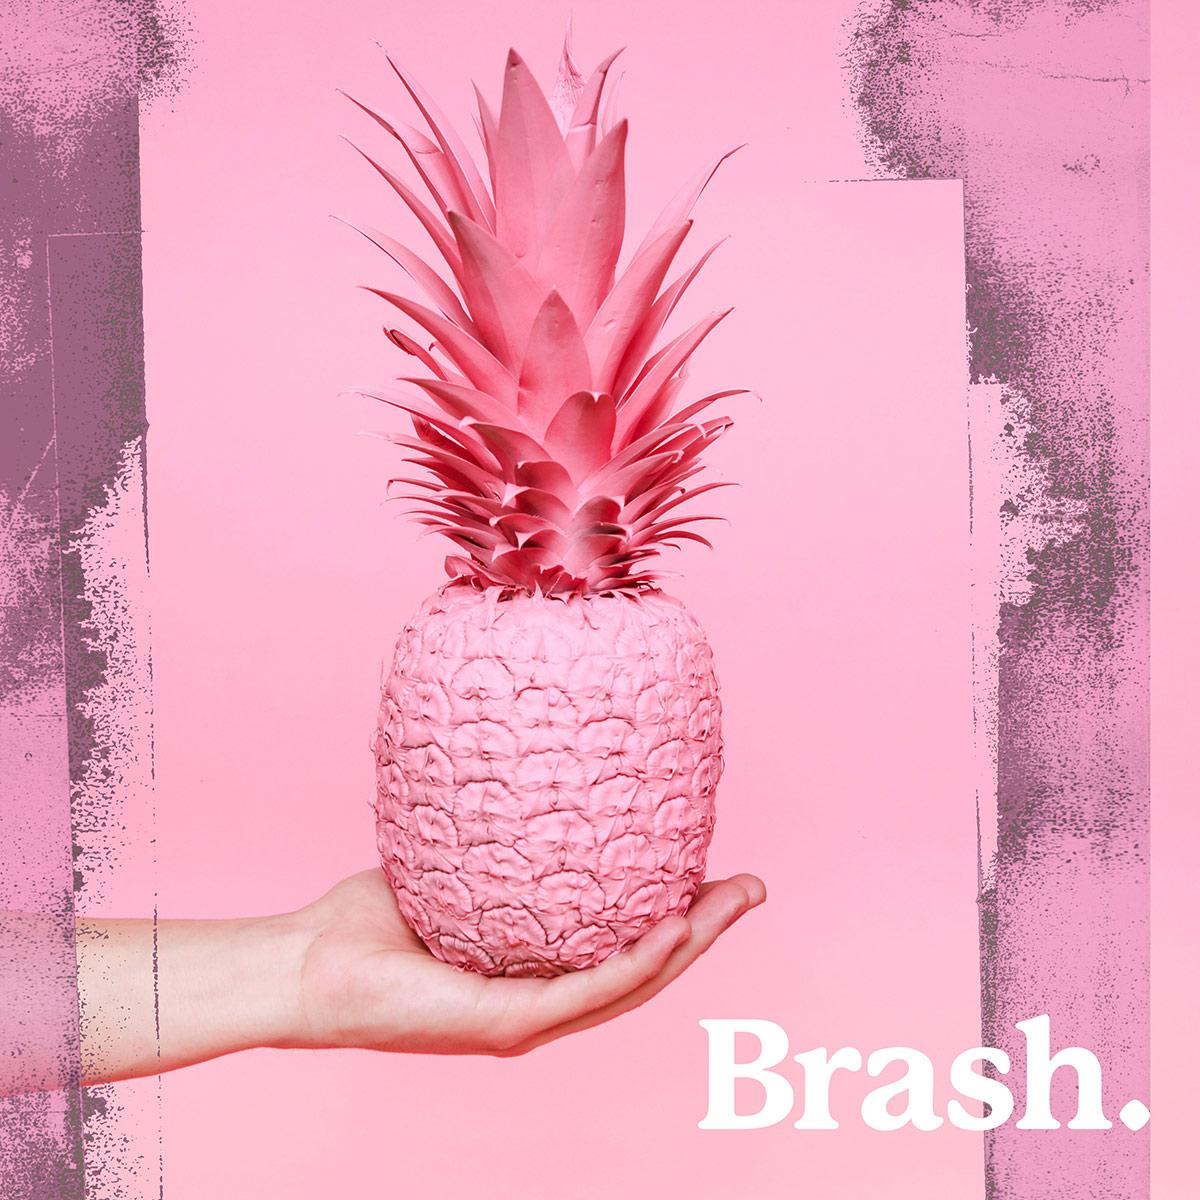 Brash-PineappleSmalll